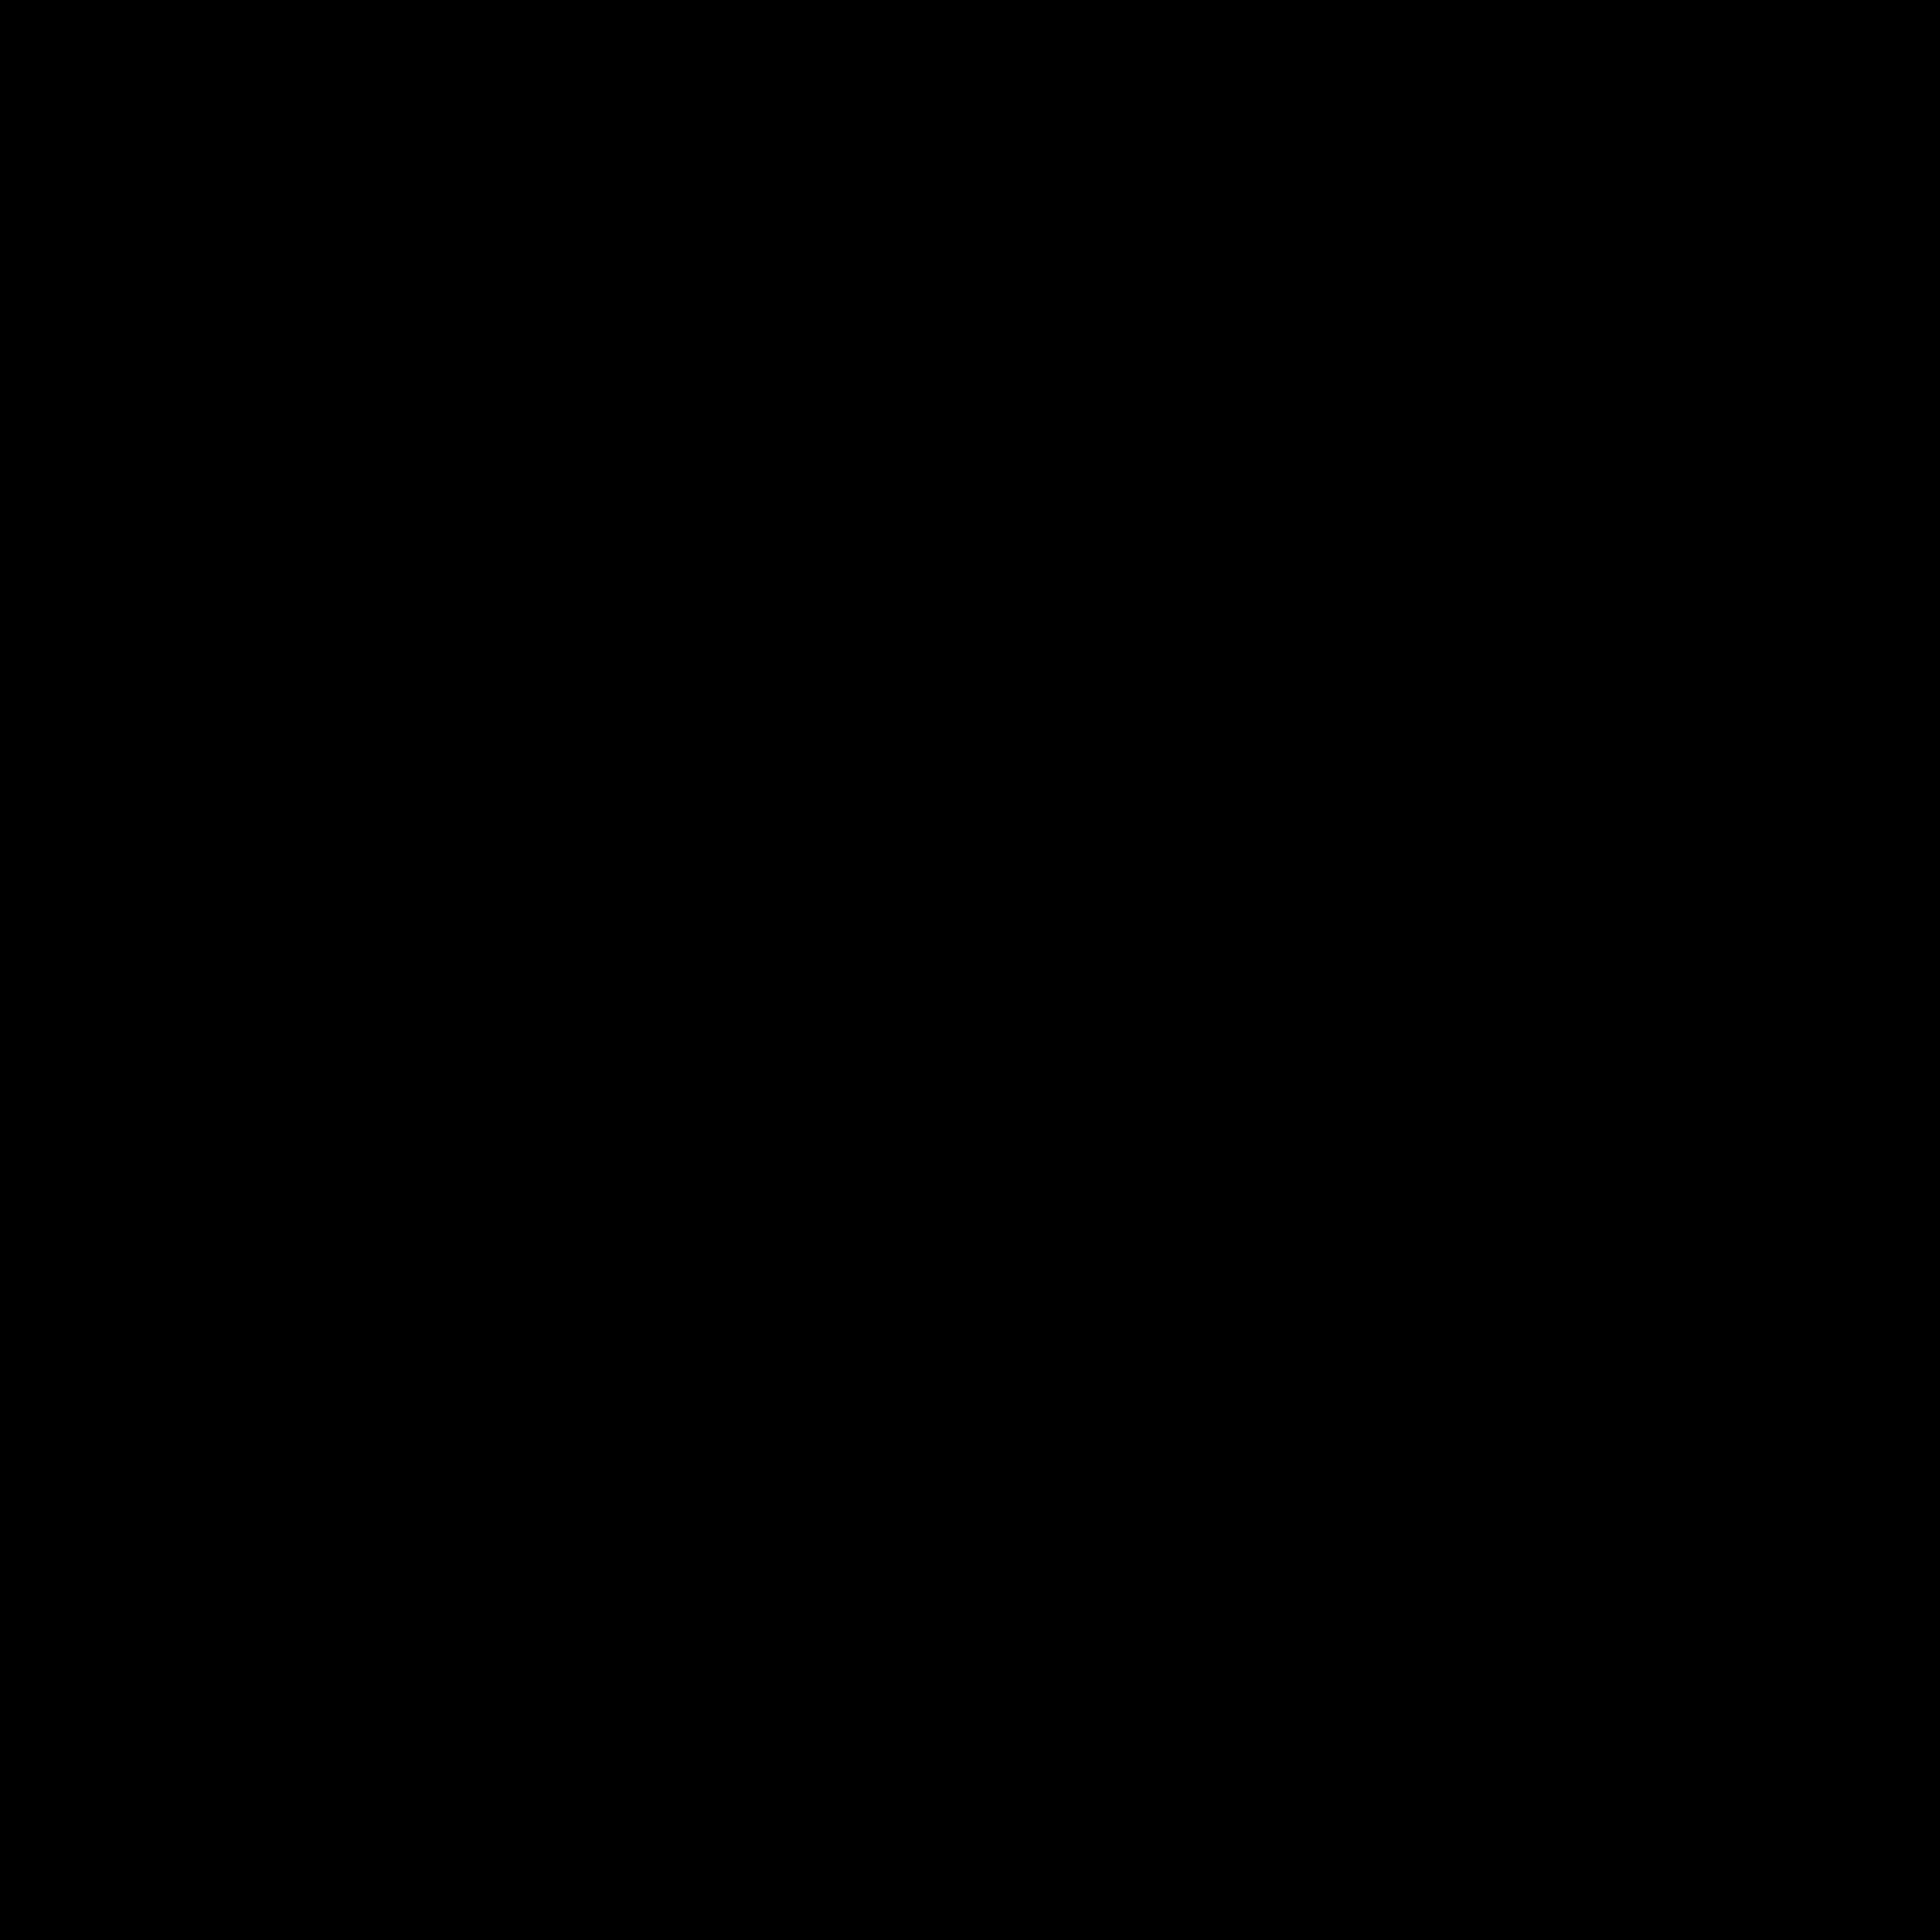 TLBD-Logos_Artboard 4.png